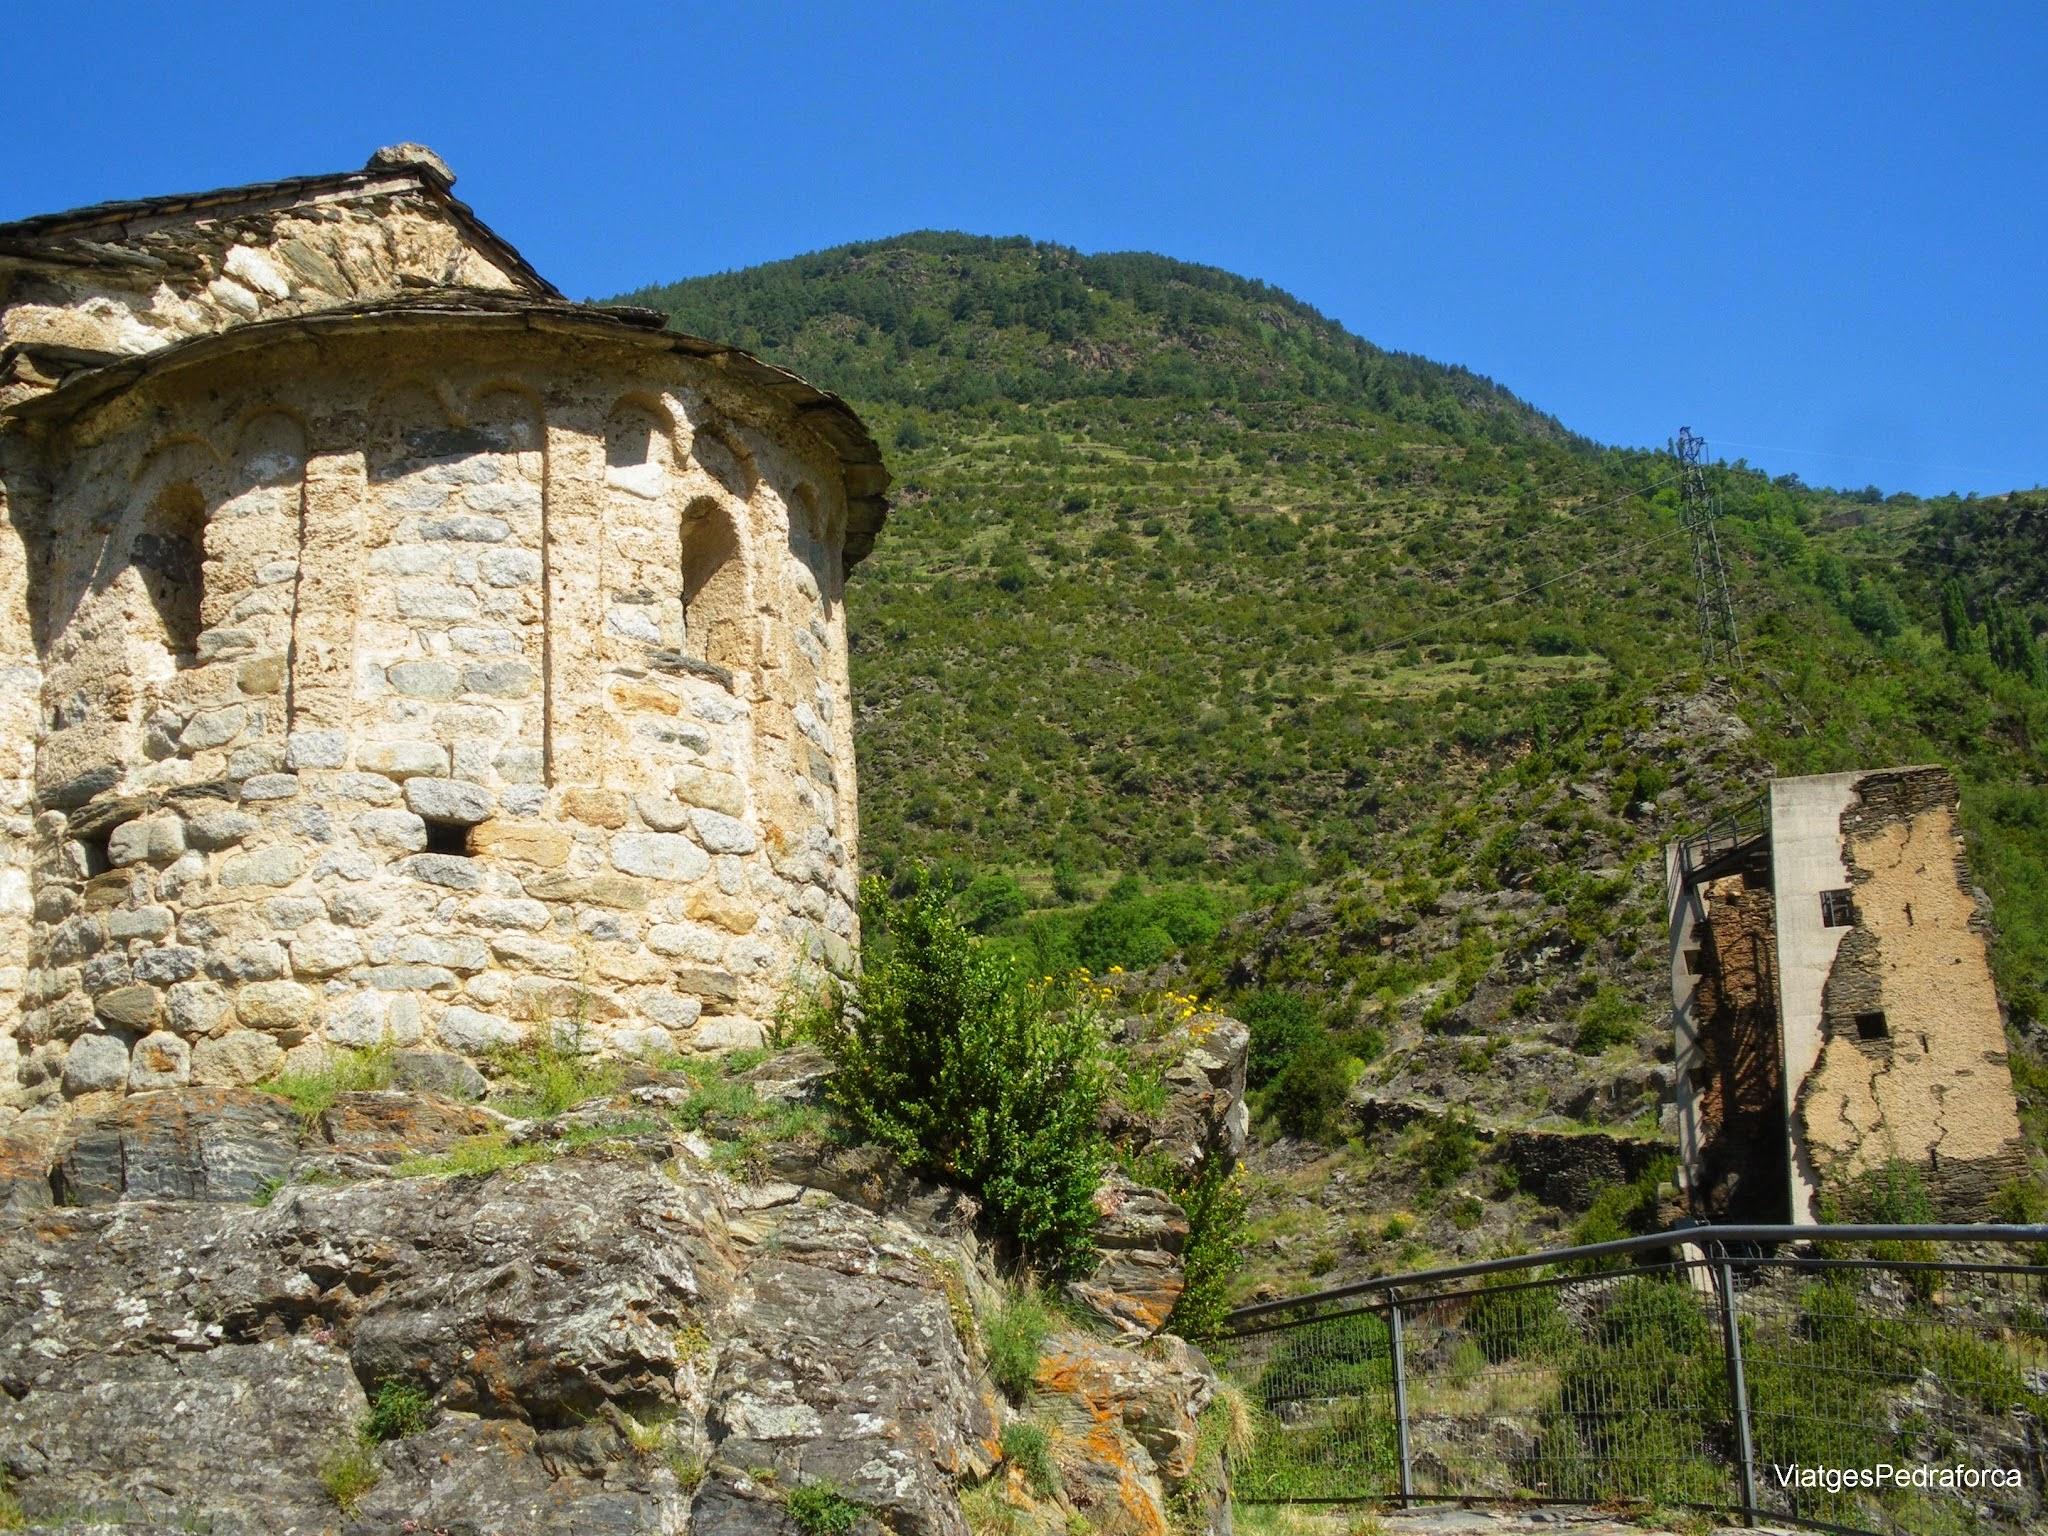 Les Bons, Encamp, Andorra, trekking, senderisme, art romànic